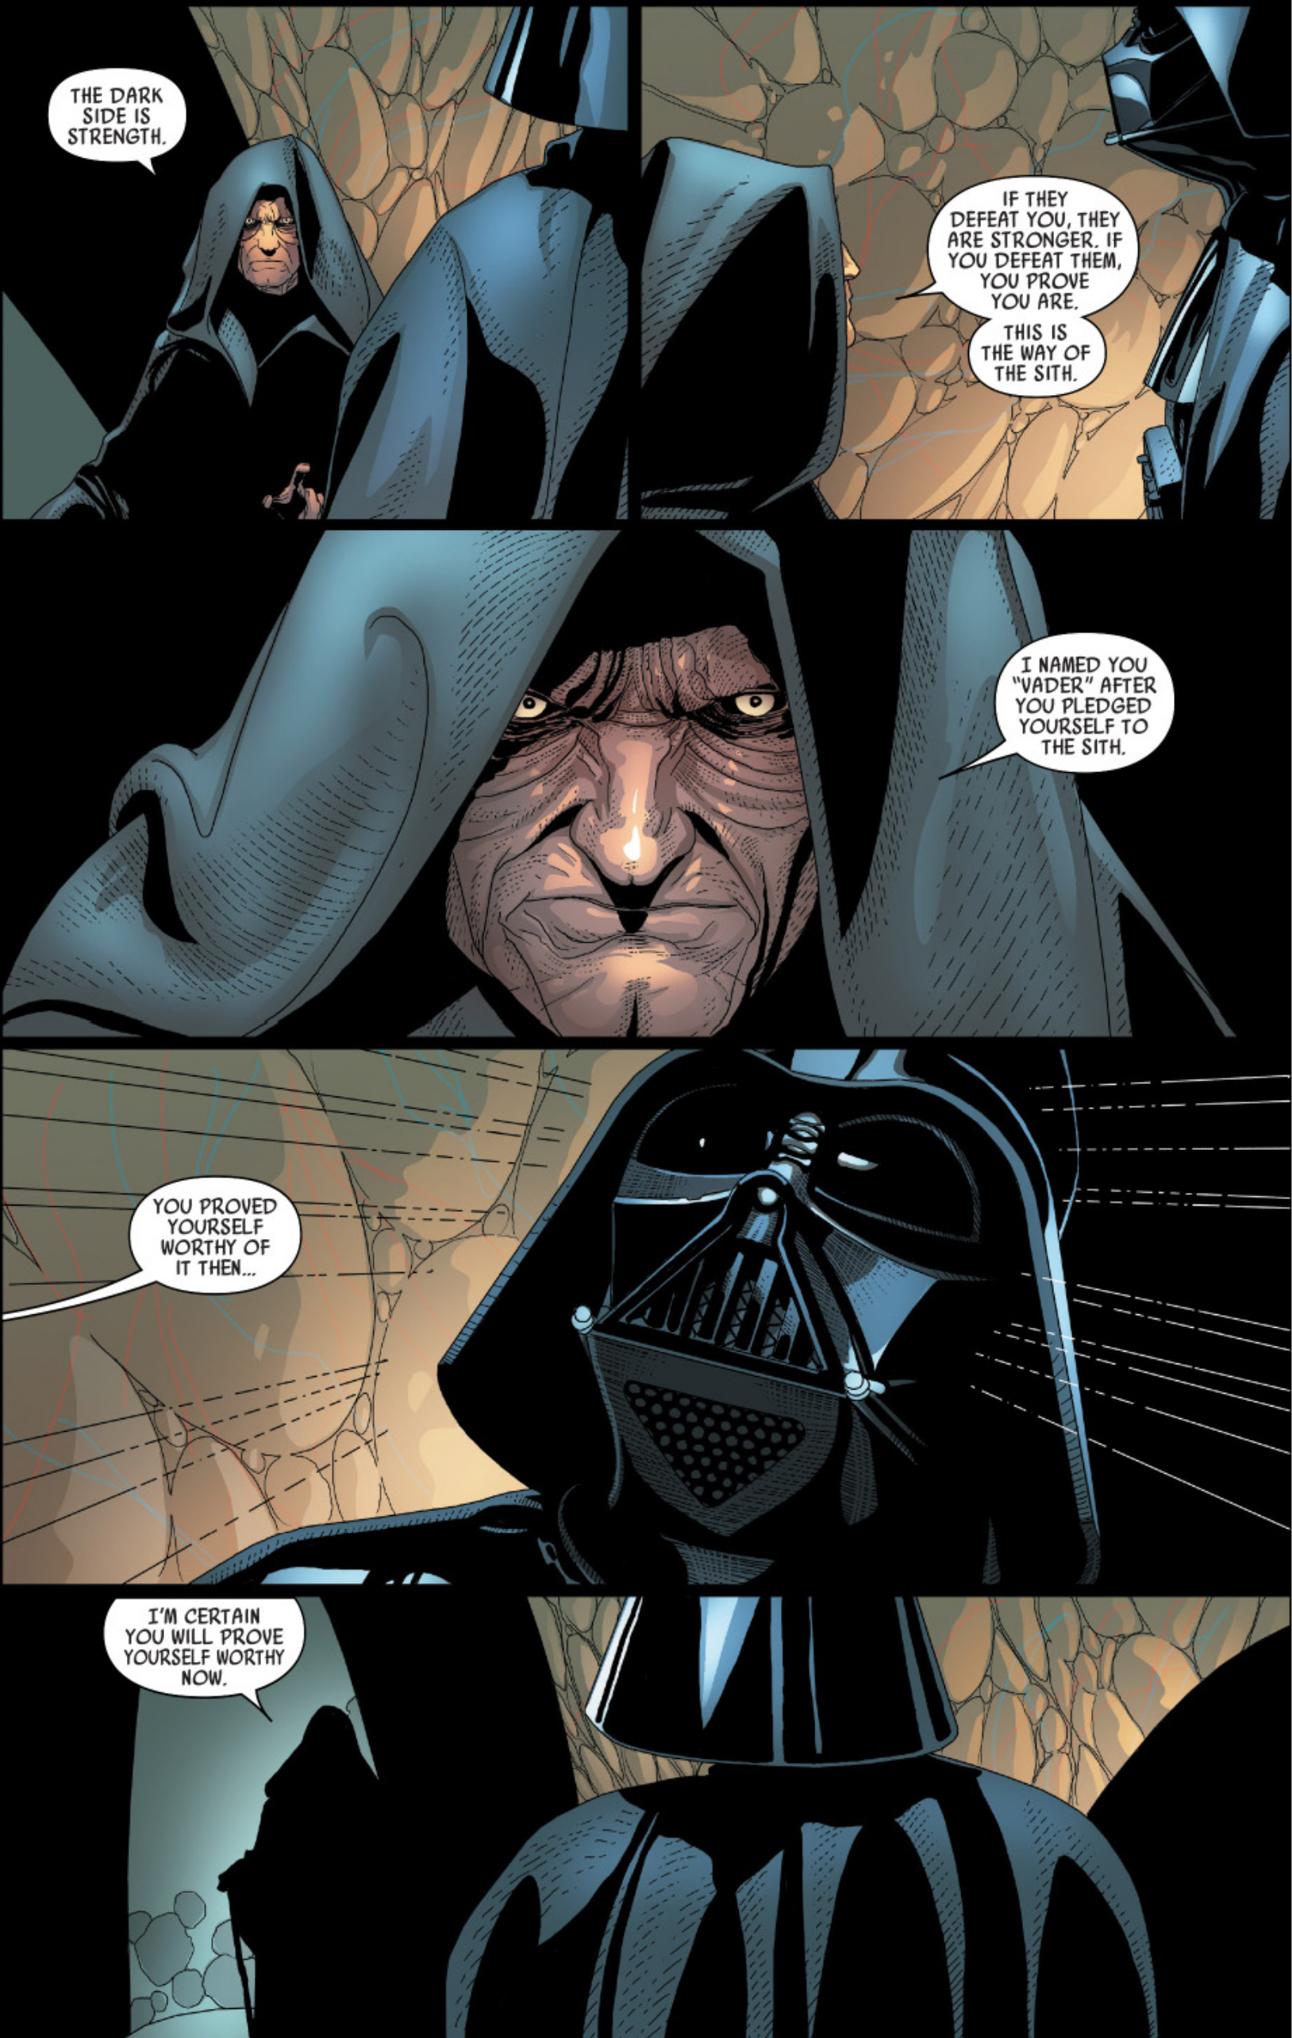 Vader Retri comicjpg